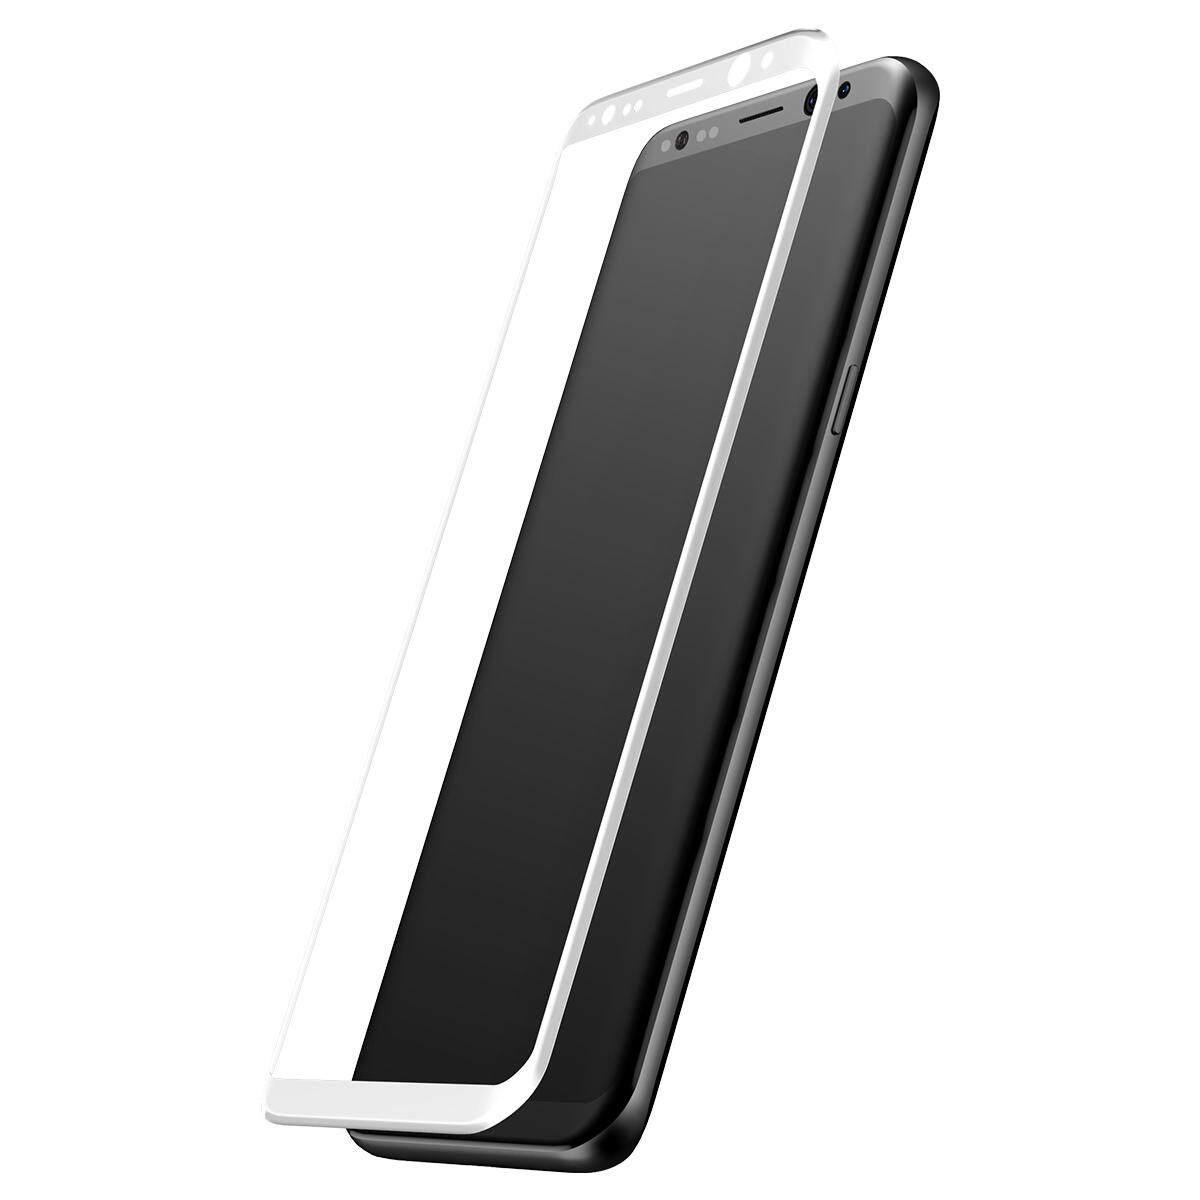 BASEUS 0.3 Mm 3D Melengkung Sutra Cetak Full Screen Tempered Pelindung Kaca untuk Samsung Galaxy S8